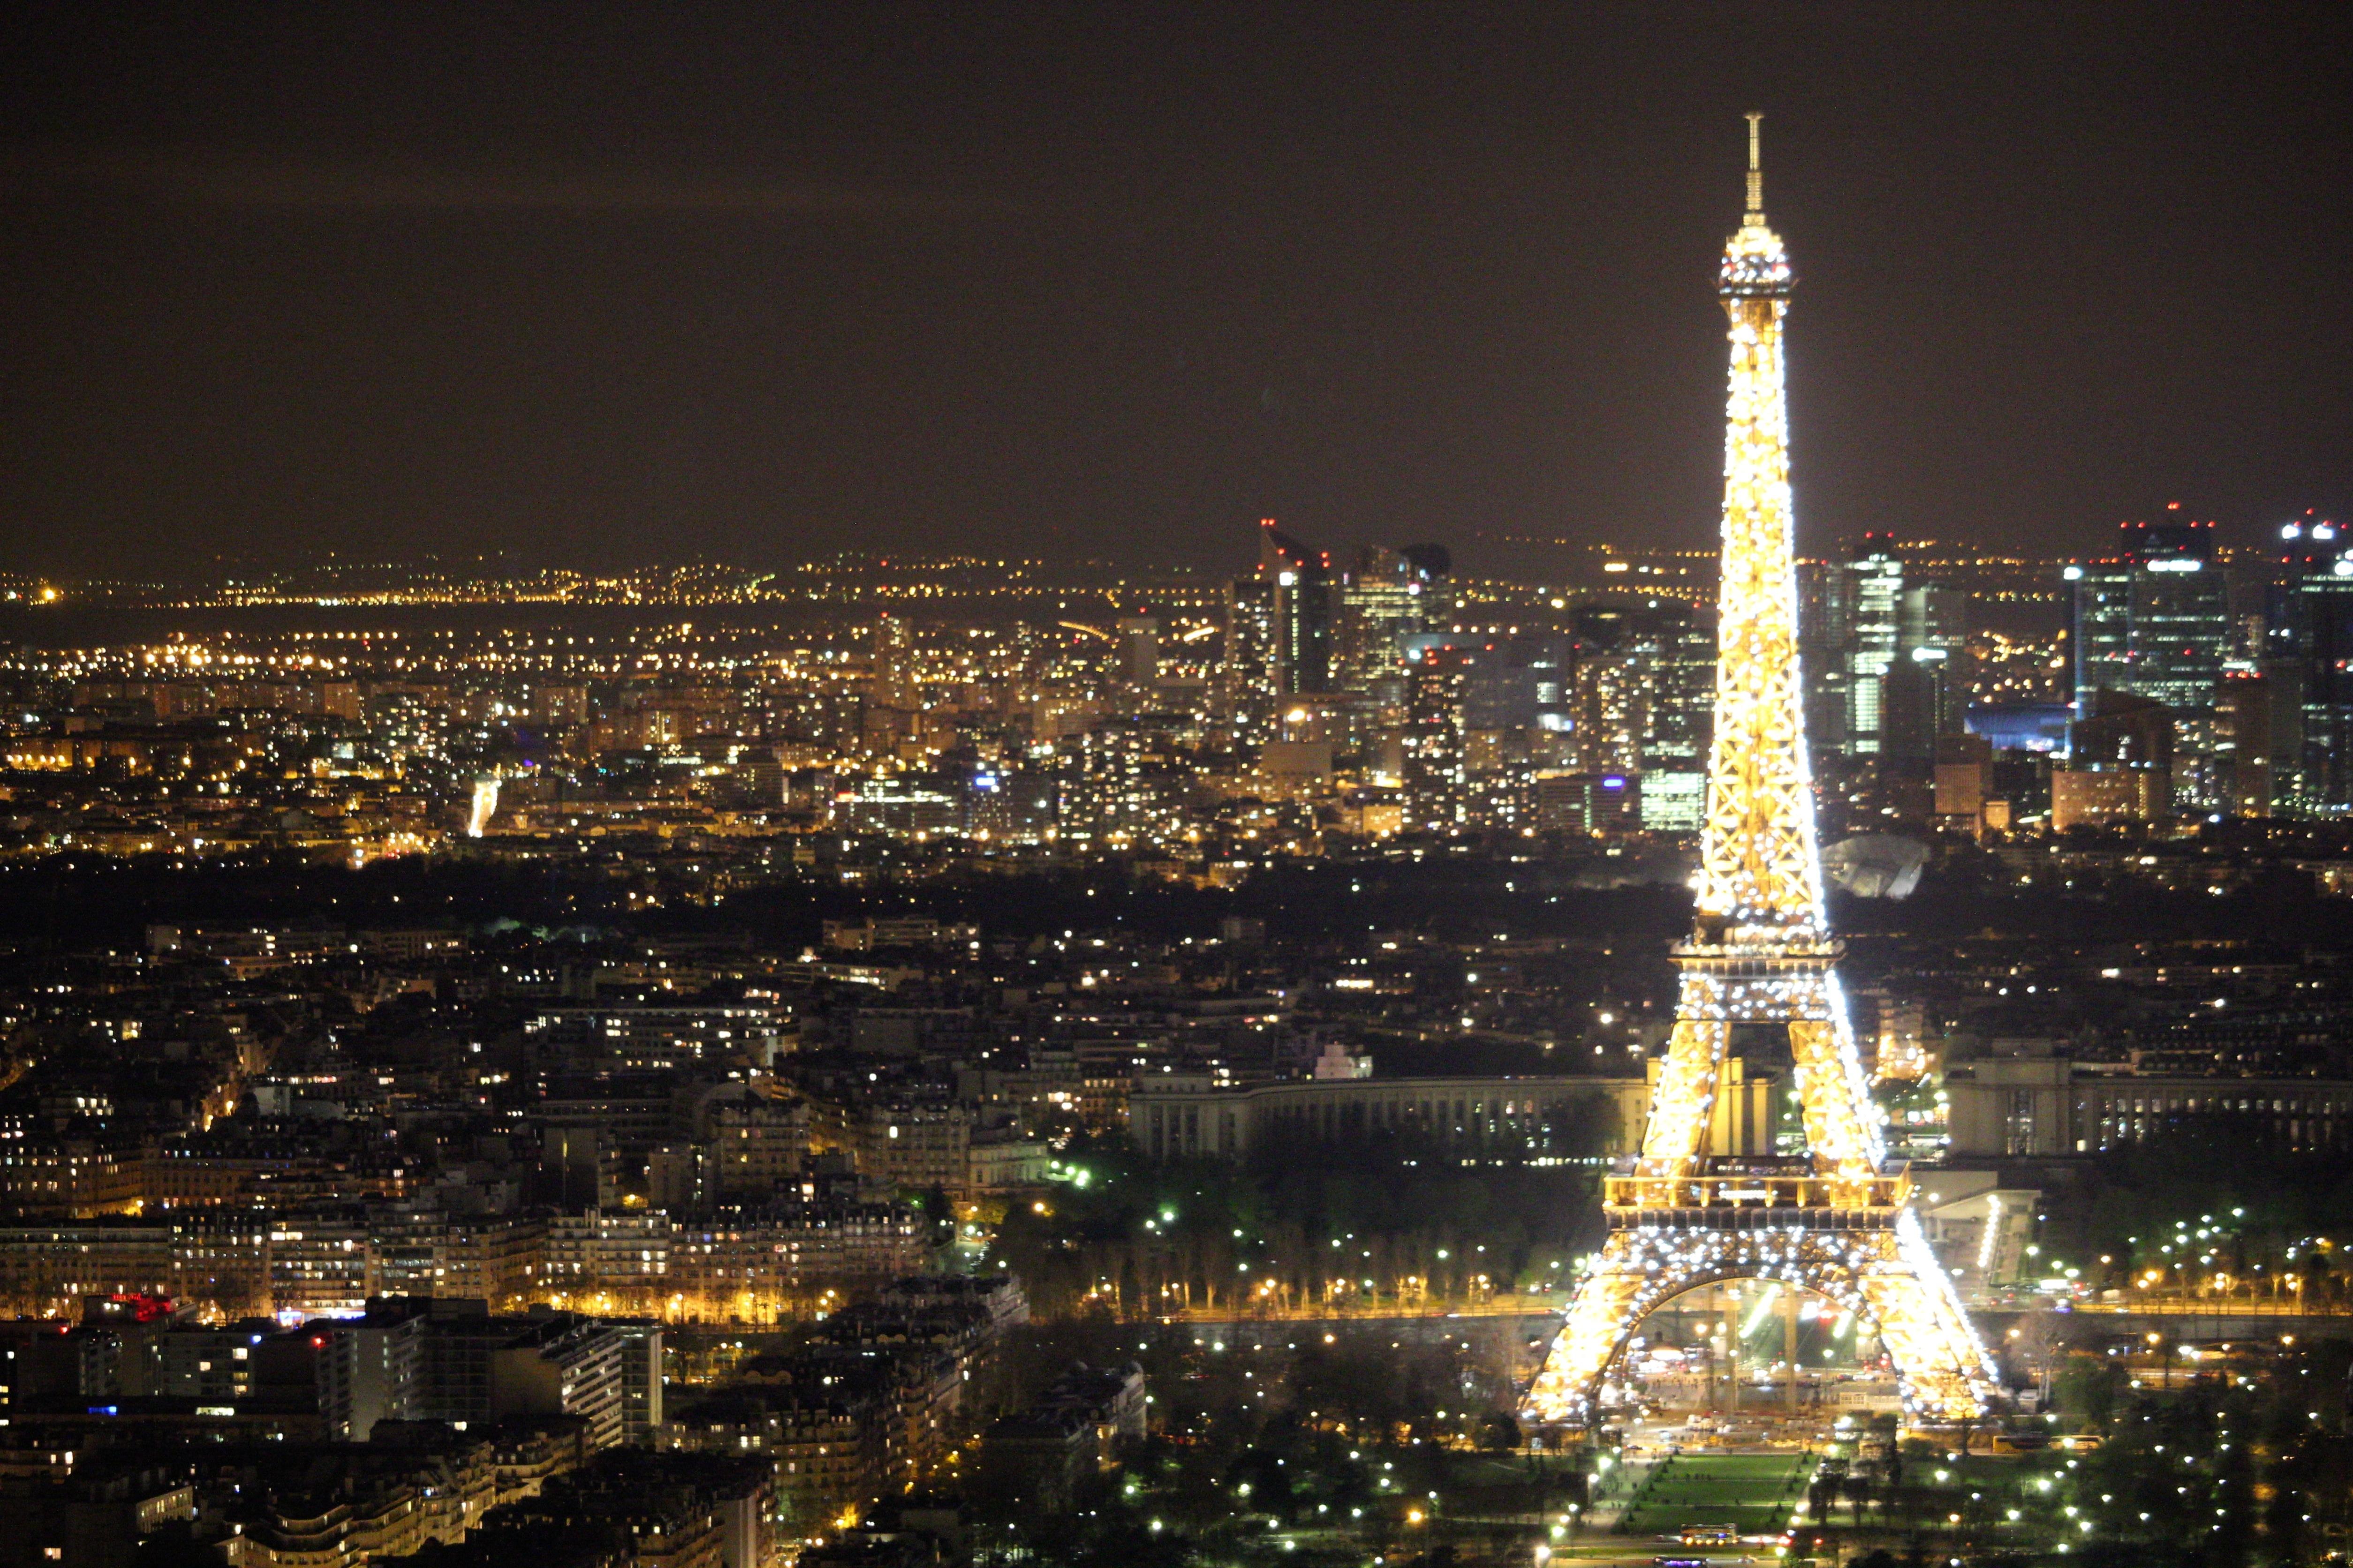 Modern Languages @ FLCC: France Study Abroad 2014, 2014, Leaf, Study, Students, HQ Photo